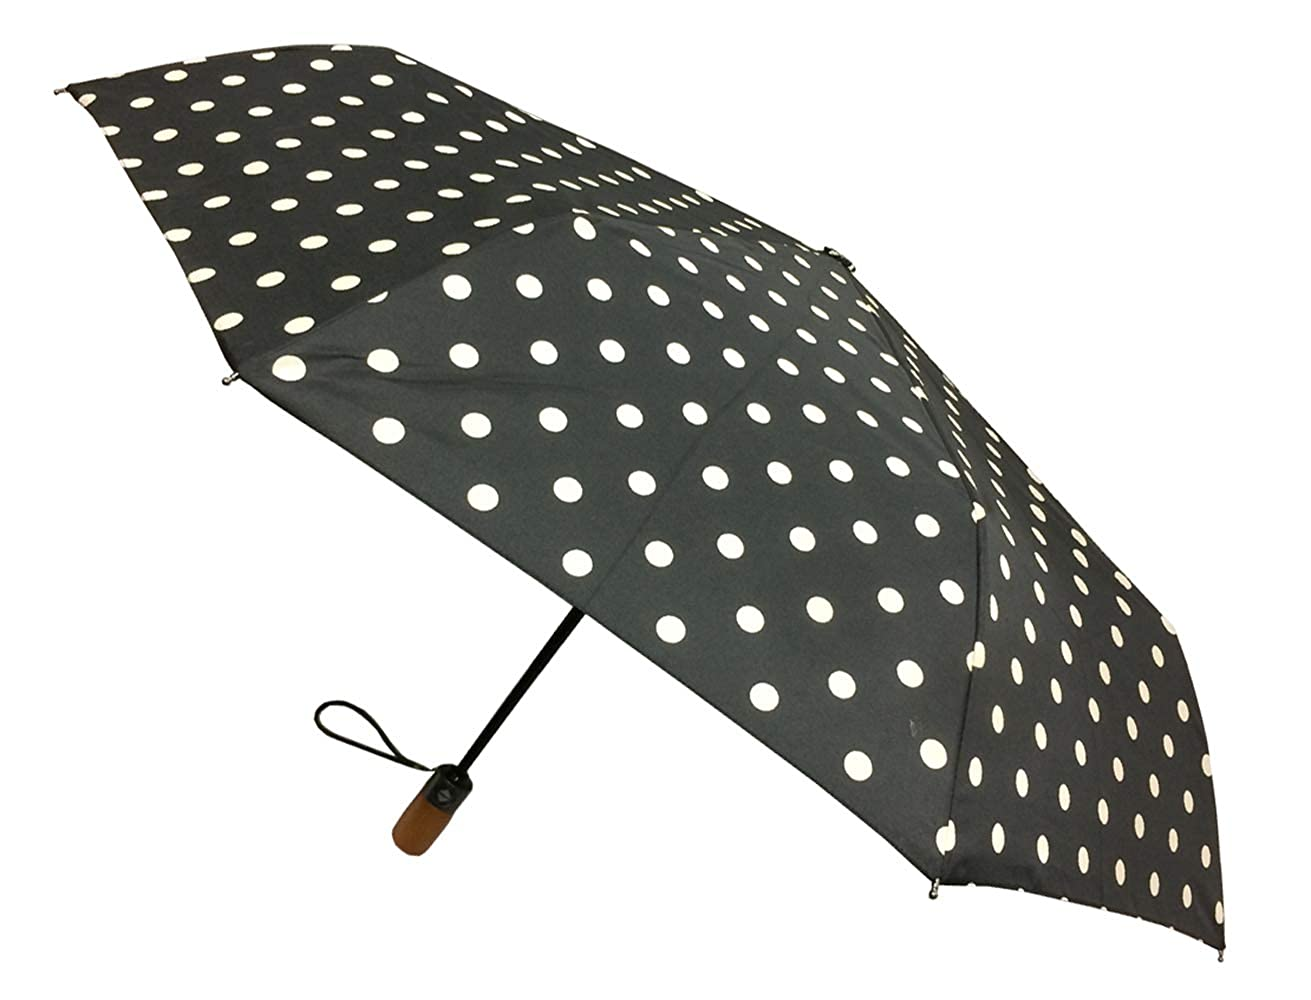 London Fog Auto Open Close Umbrella Dot Black Kenlo Umbrellas 931